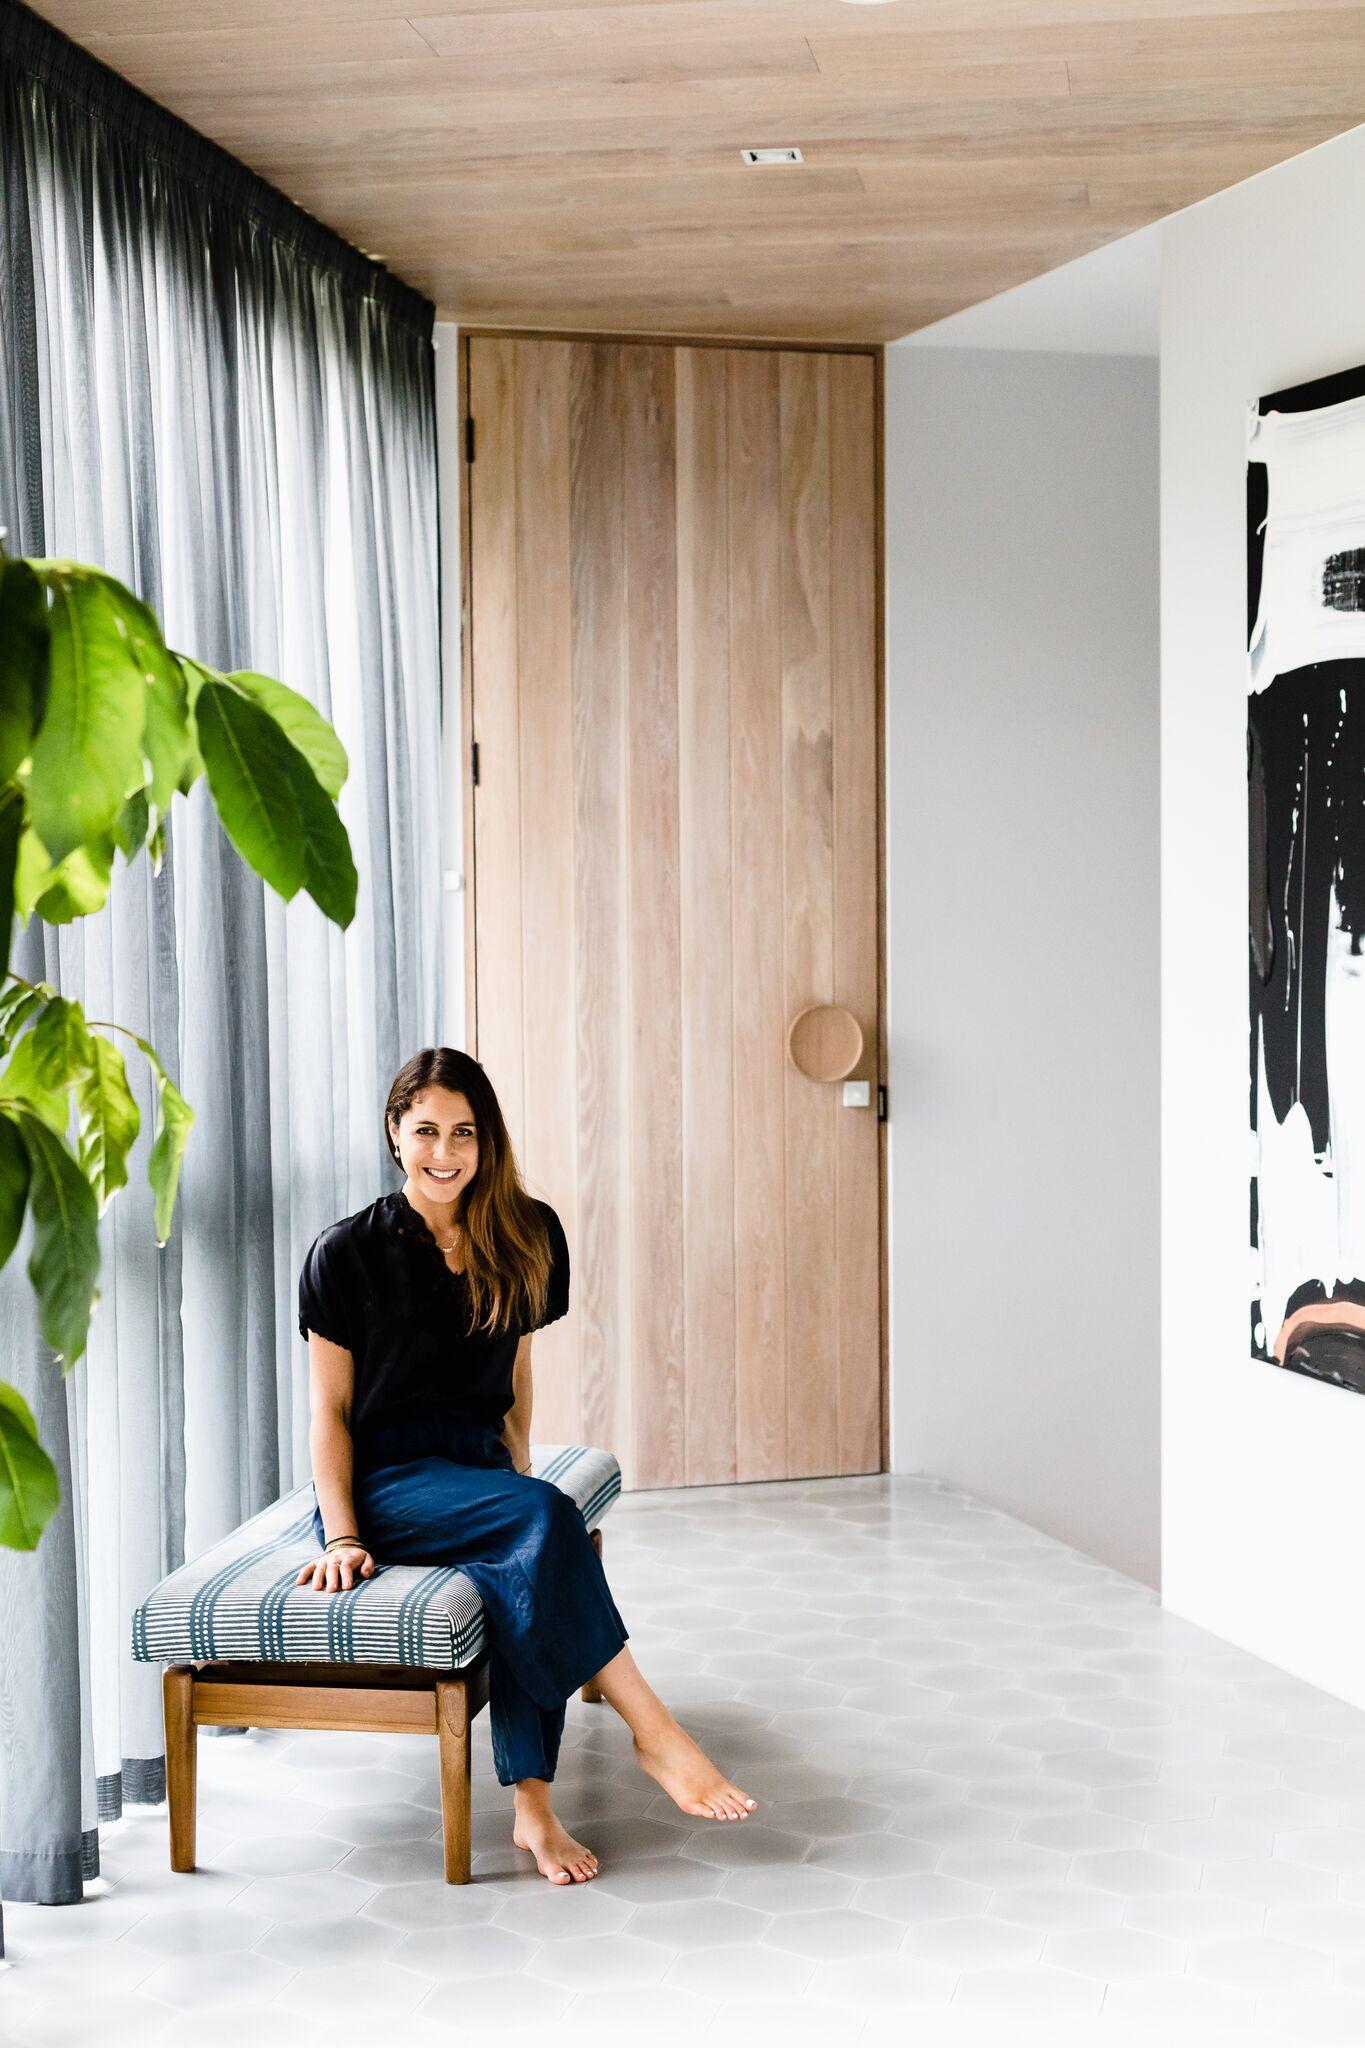 Gallery Of Balwyn Home By Studio Ezra Local Australian Design & Interiors Balwyn, Melbourne Image 3